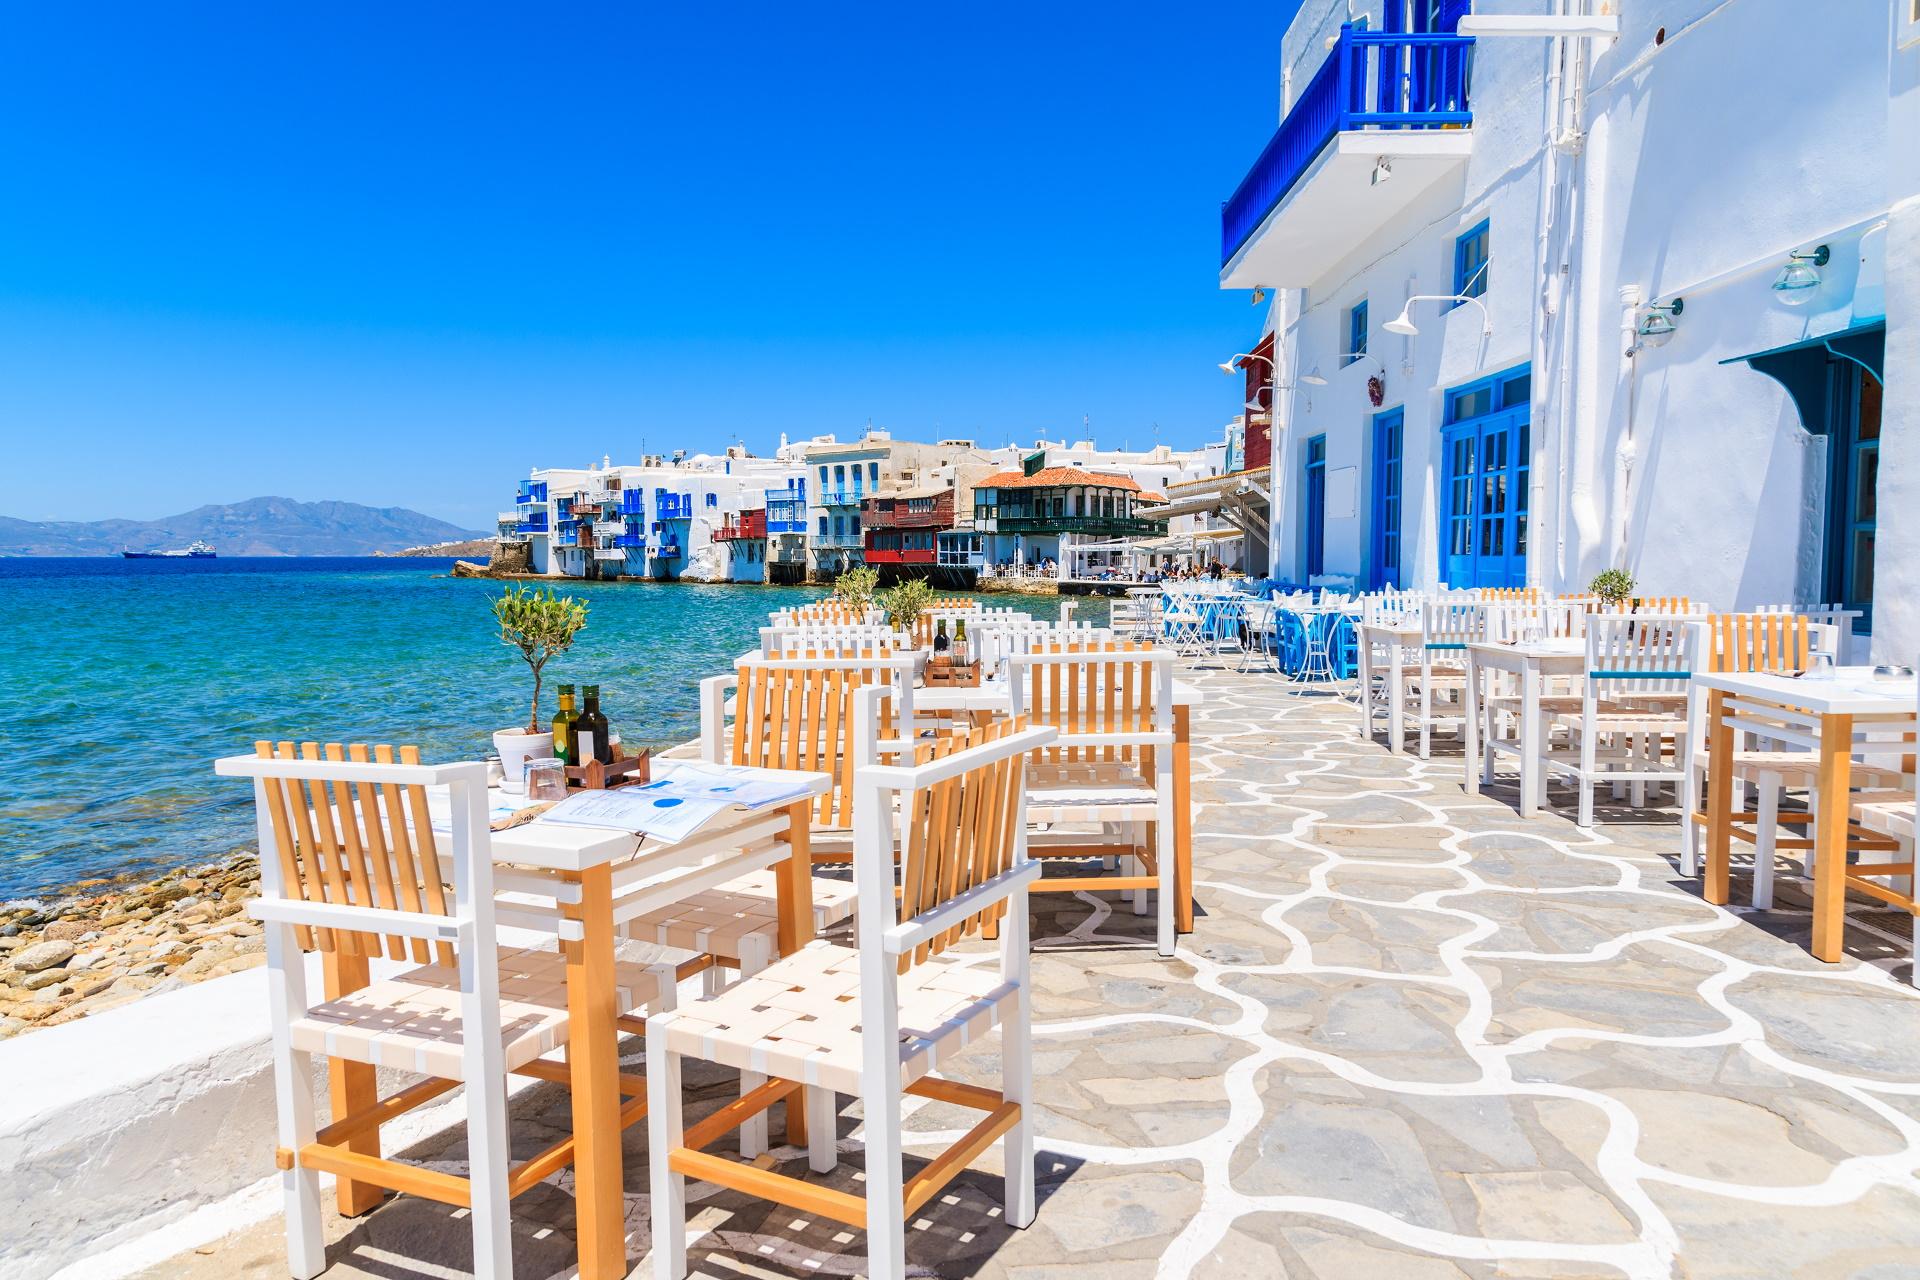 Urlaub Griechenland Corona